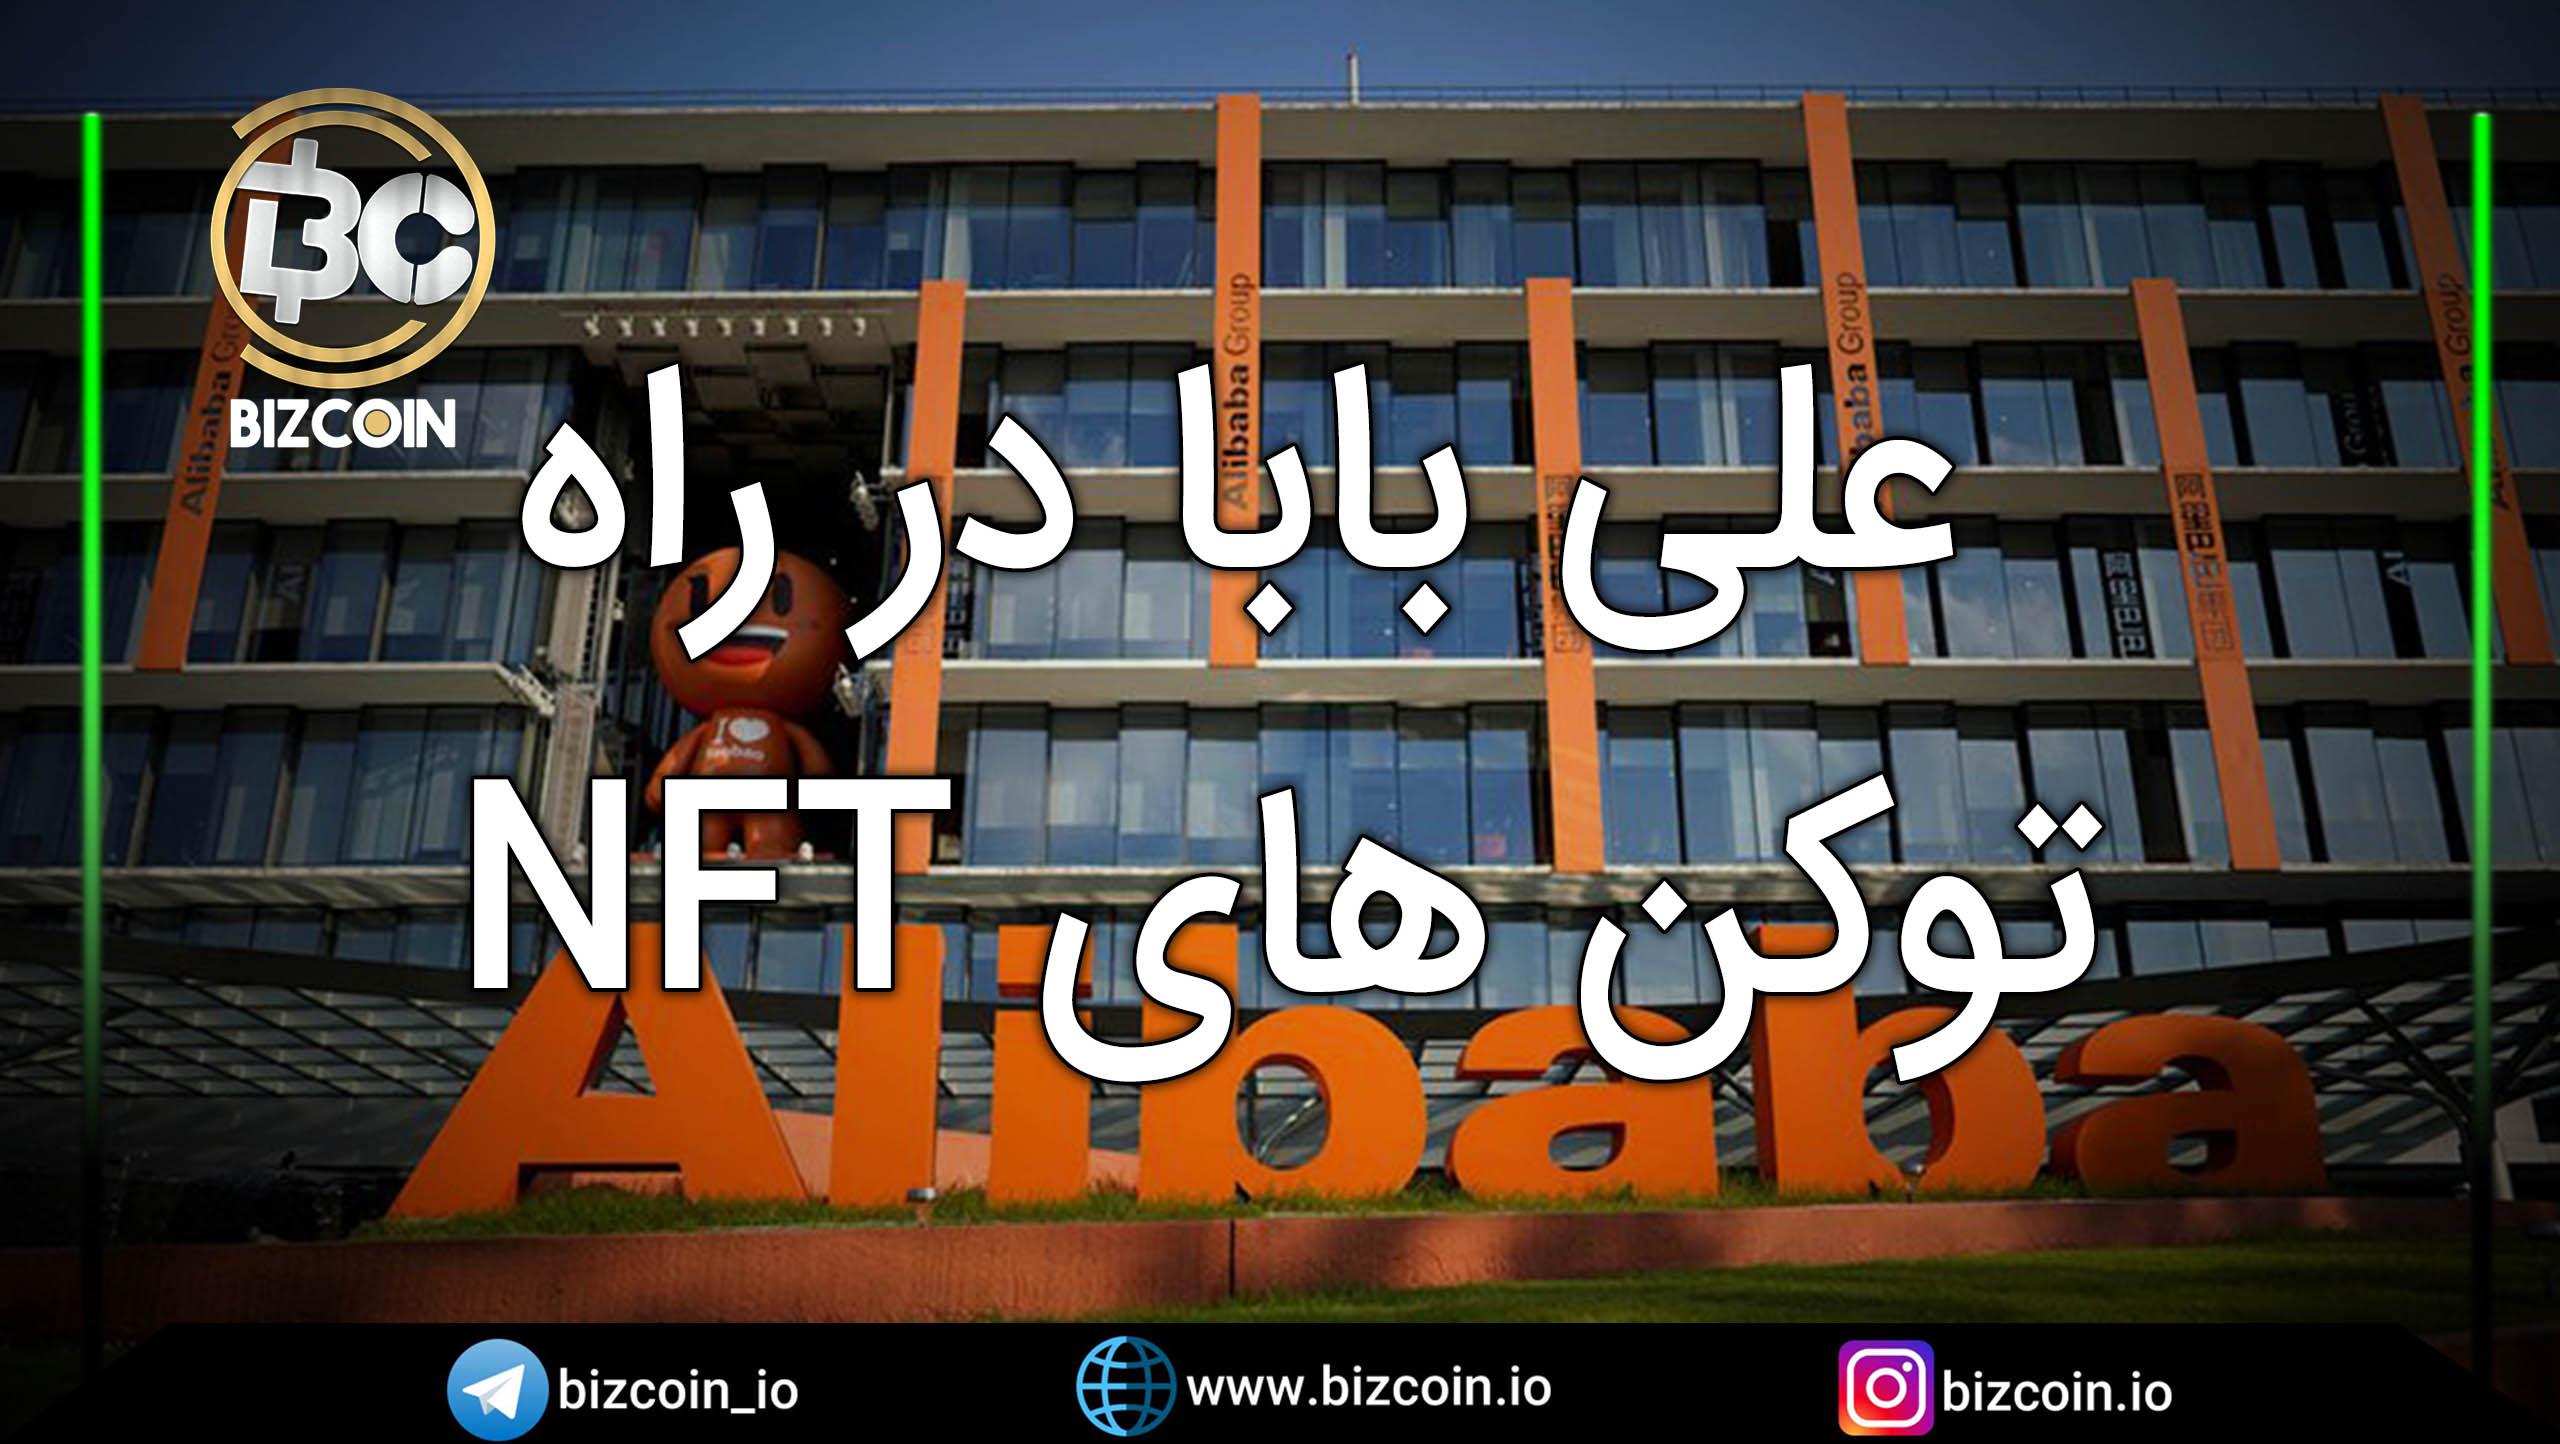 Alibaba in the way of NFT tokens علی بابا در حال راه اندازی توکن های NFT